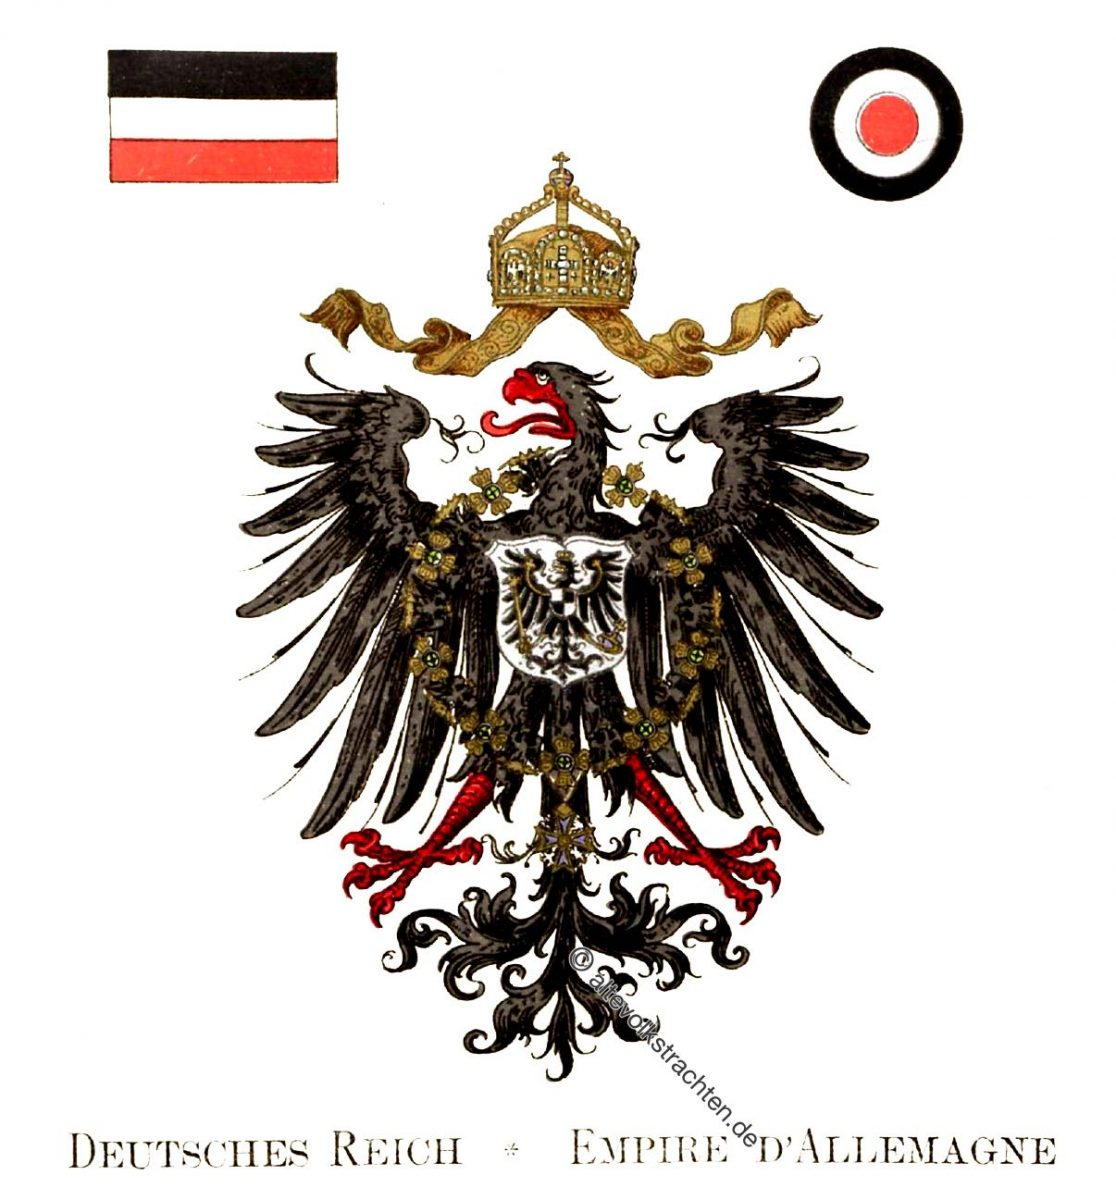 Deutsches Reich, Empire D'Allemand, Staatswappen, Wappen, Heraldik, Deutschland, Landesflaggen, Cocarden, heraldry, héraldique, armoiries,